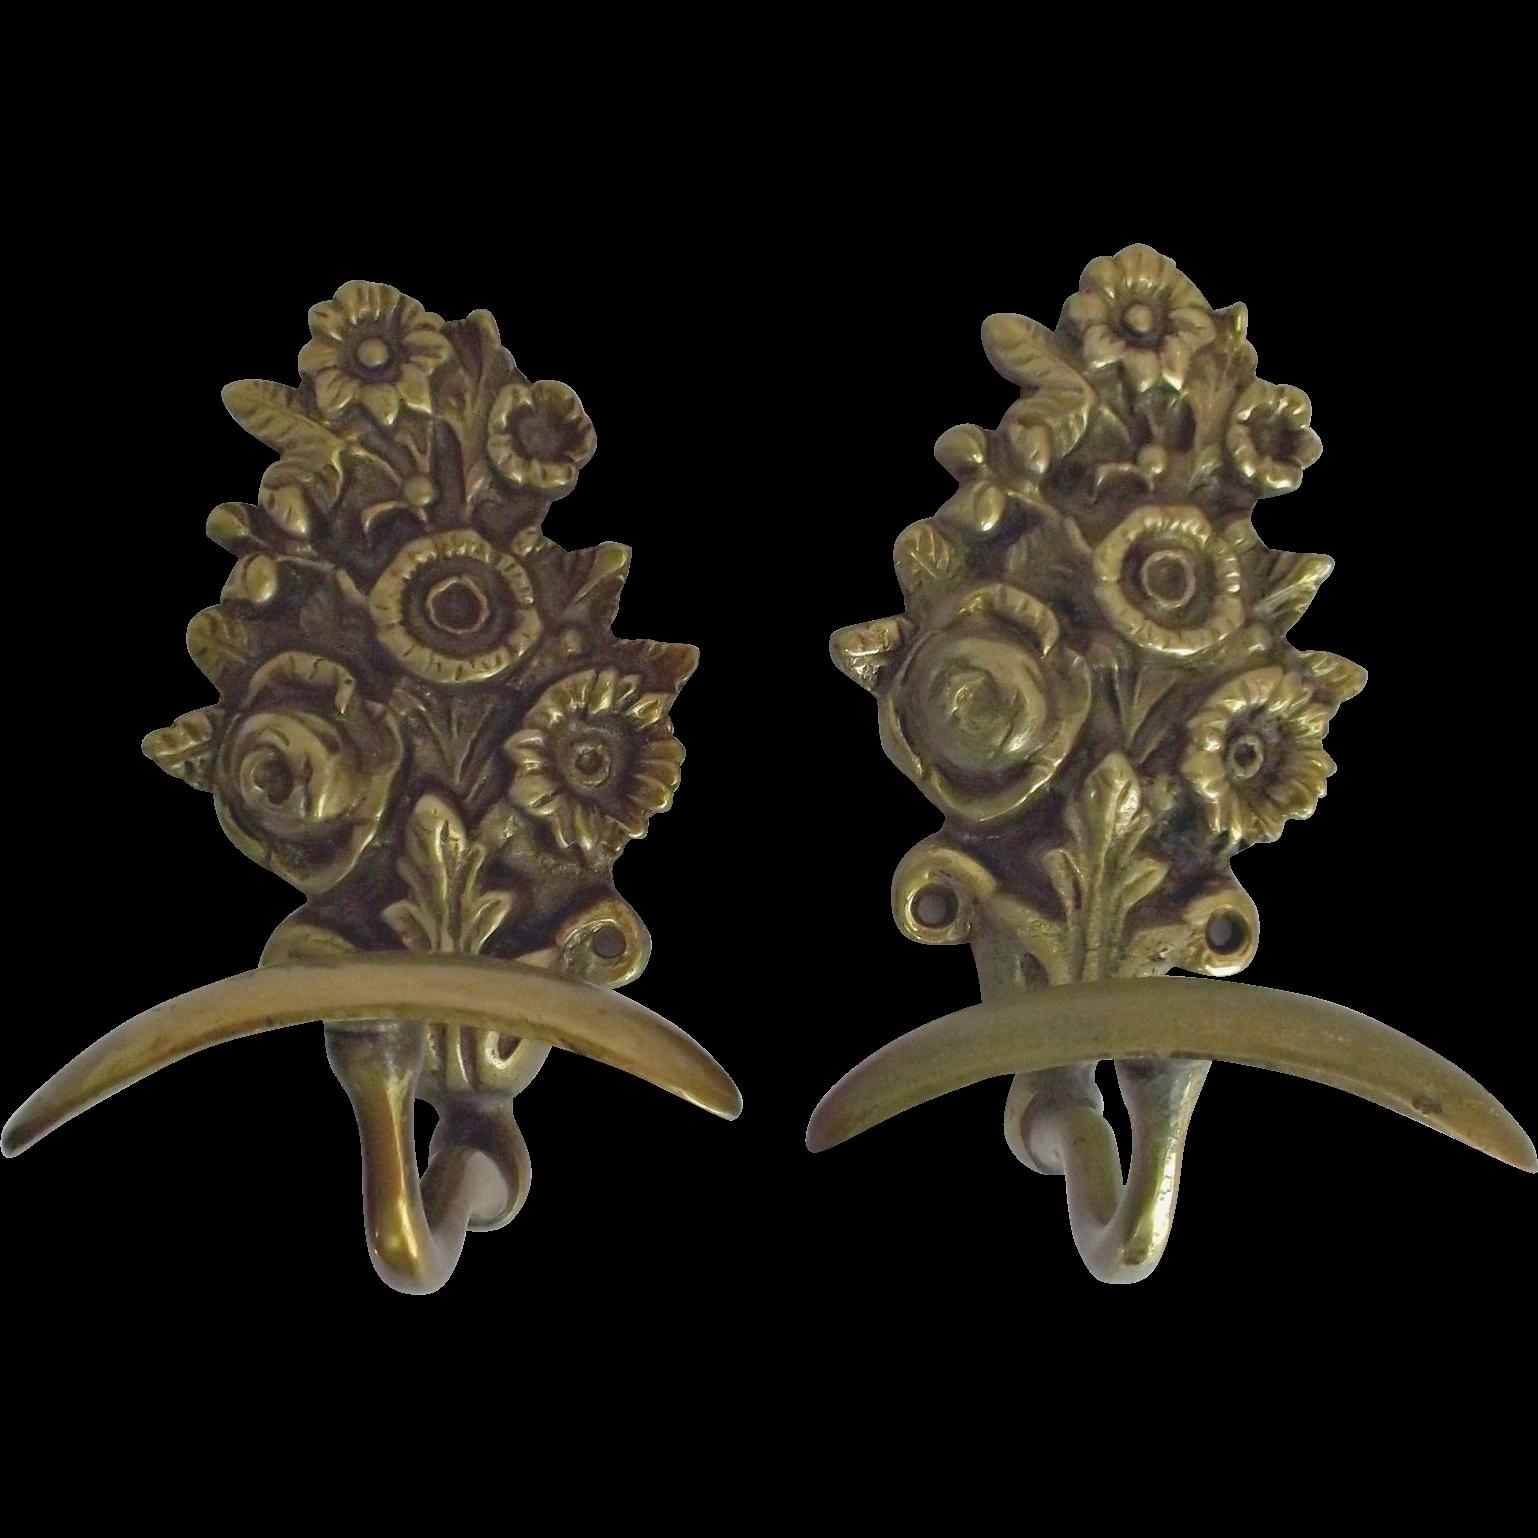 Vintage Brass Metal Wall Hooks Hangers Floral